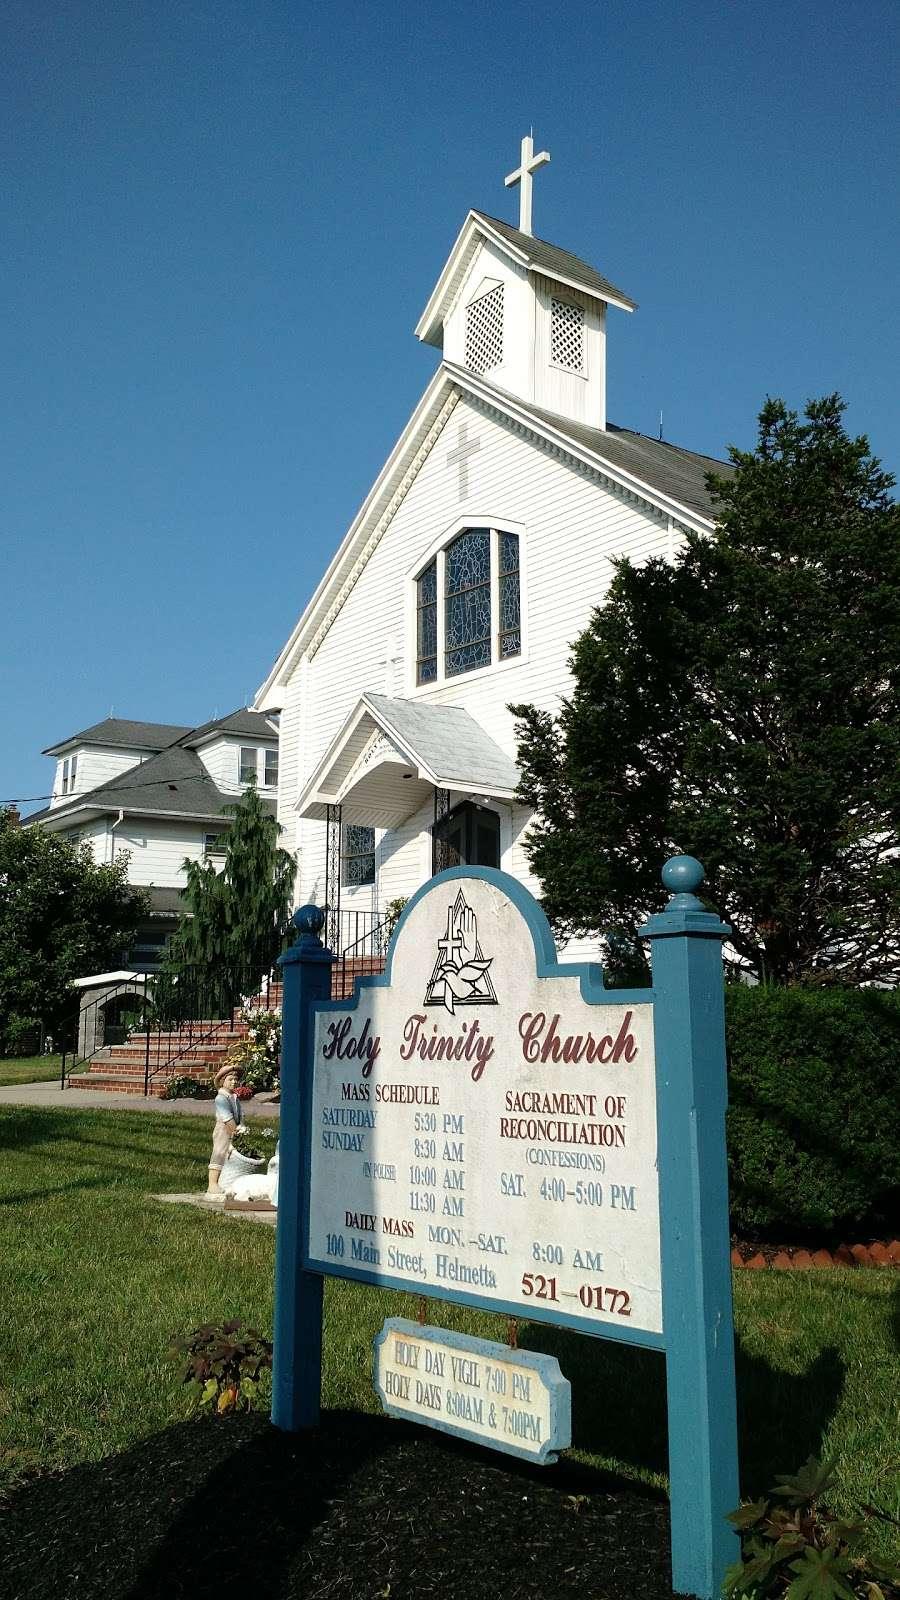 Holy Trinity Church - church  | Photo 5 of 6 | Address: 100 Main St, Helmetta, NJ 08828, USA | Phone: (732) 521-0172